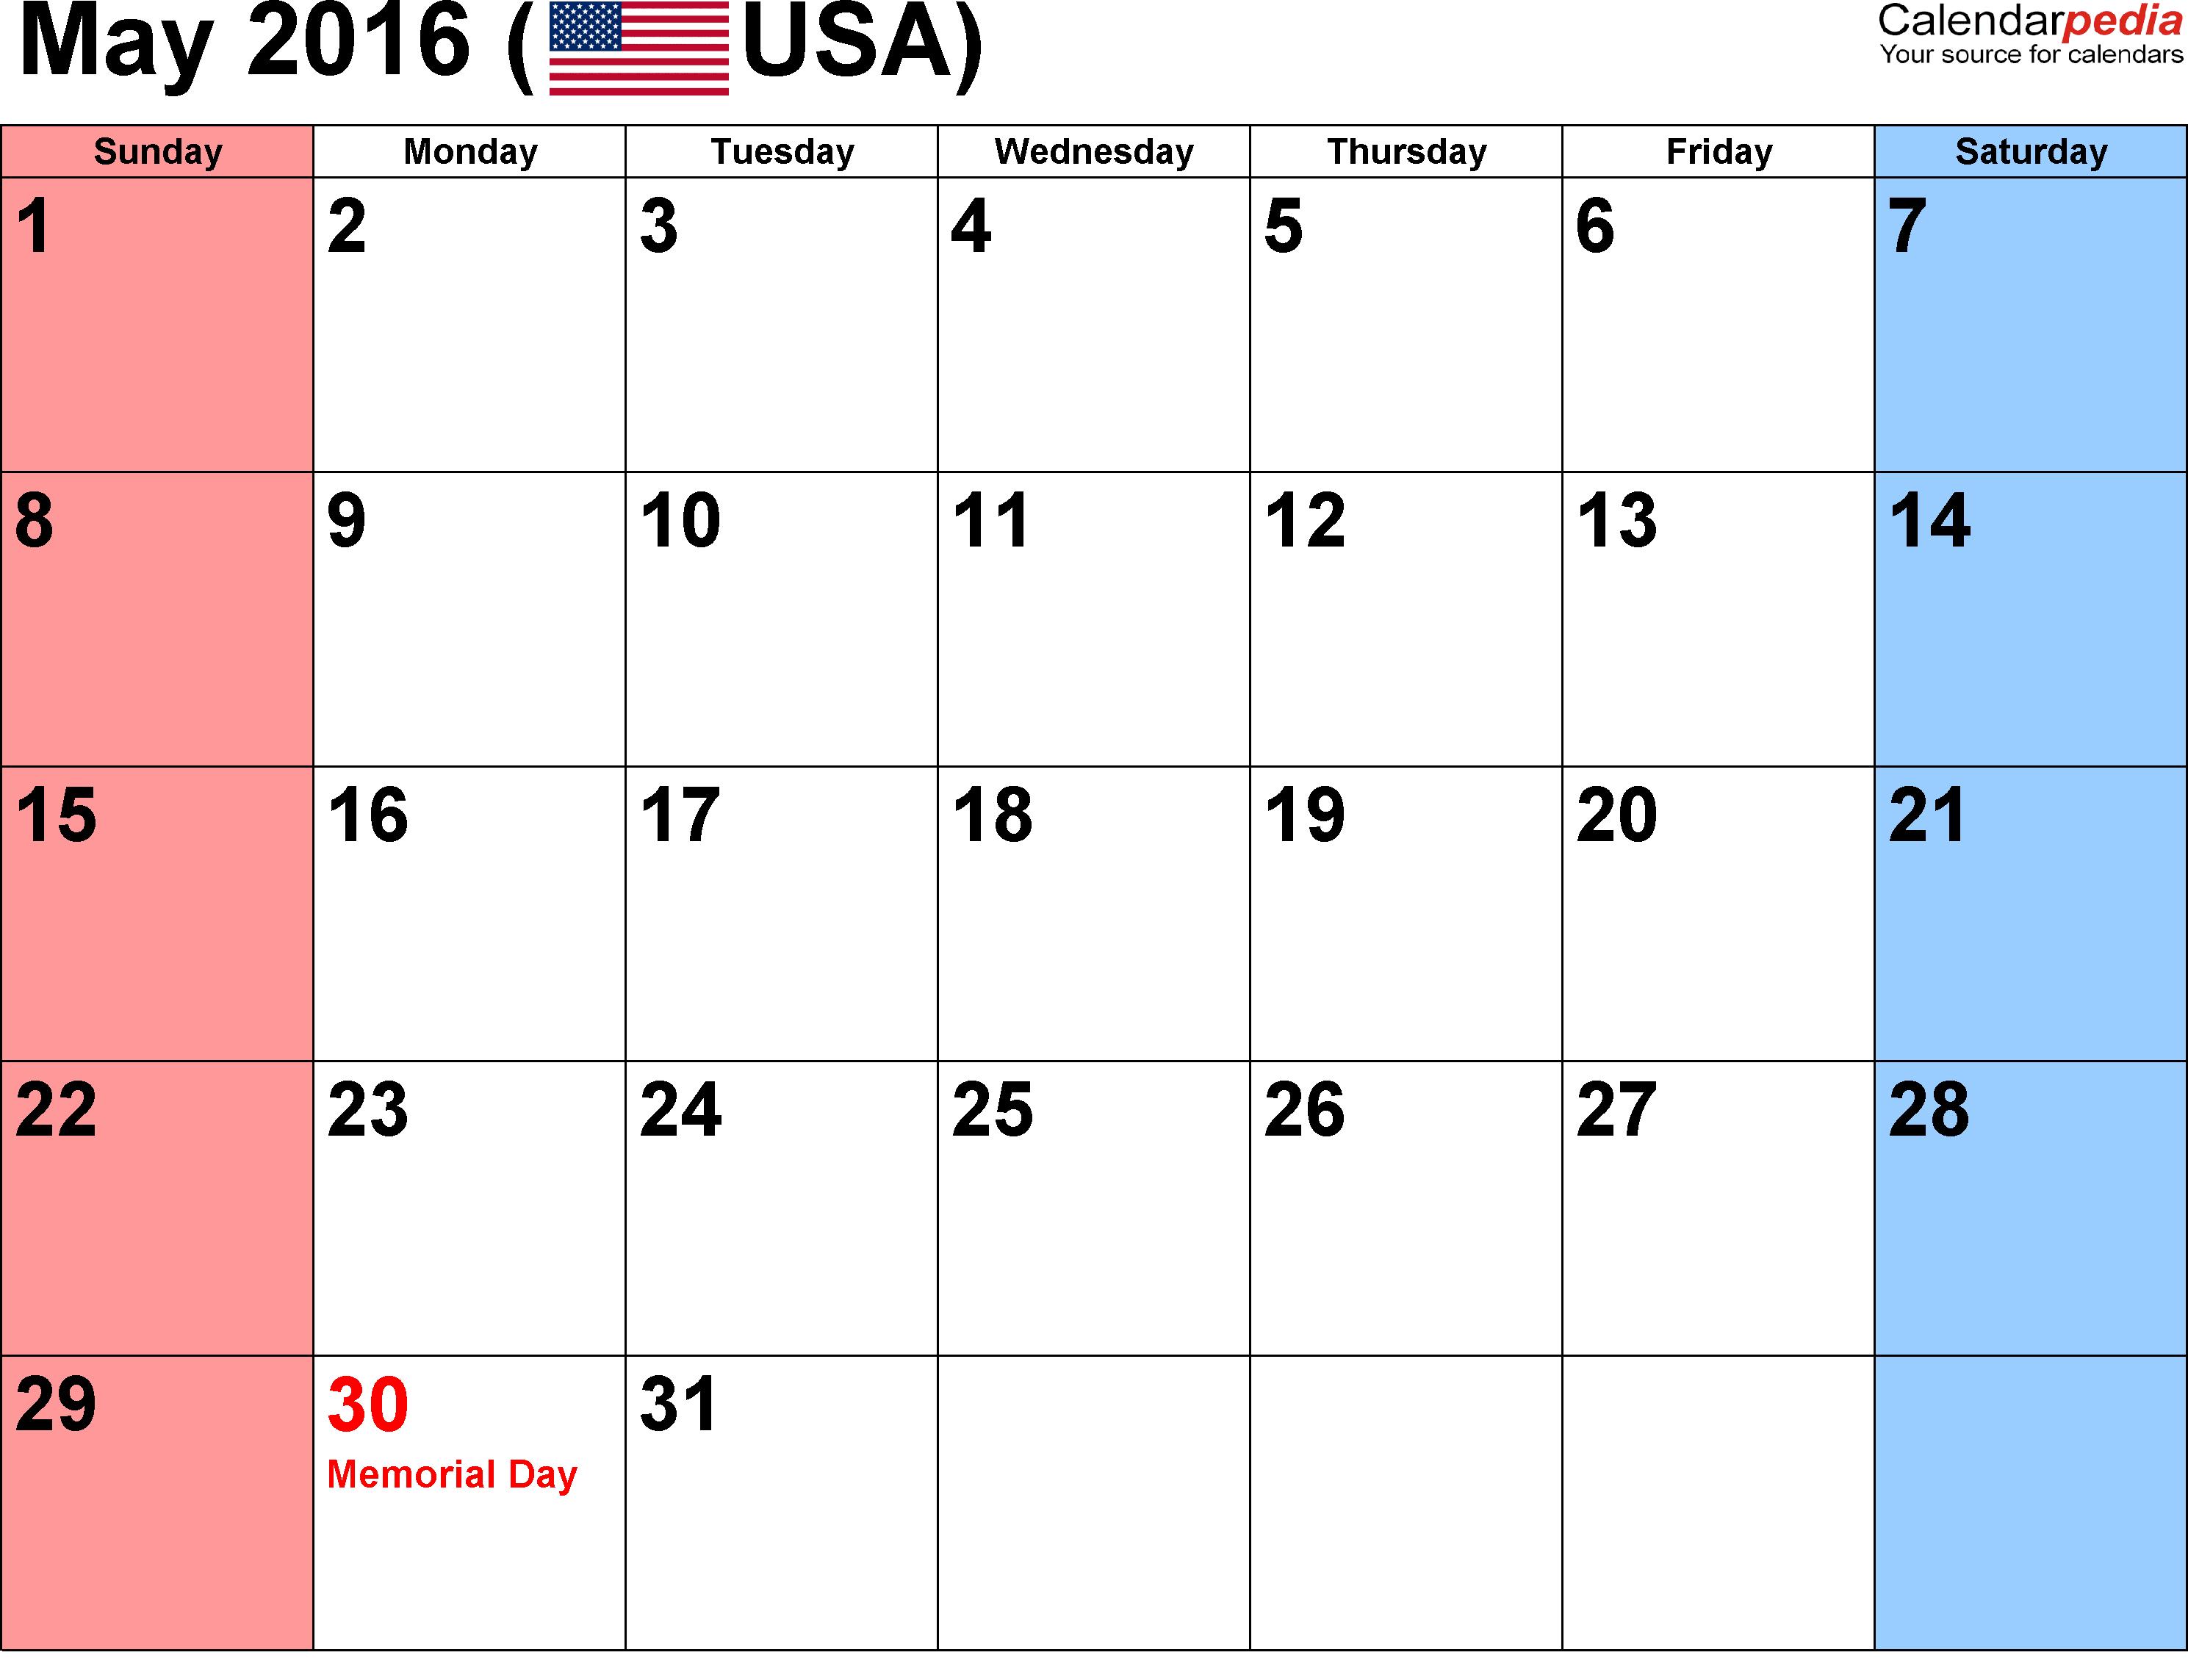 Calendar, May 2016 Weekly Blank Templates, May 2016 Weekly Calendar ...